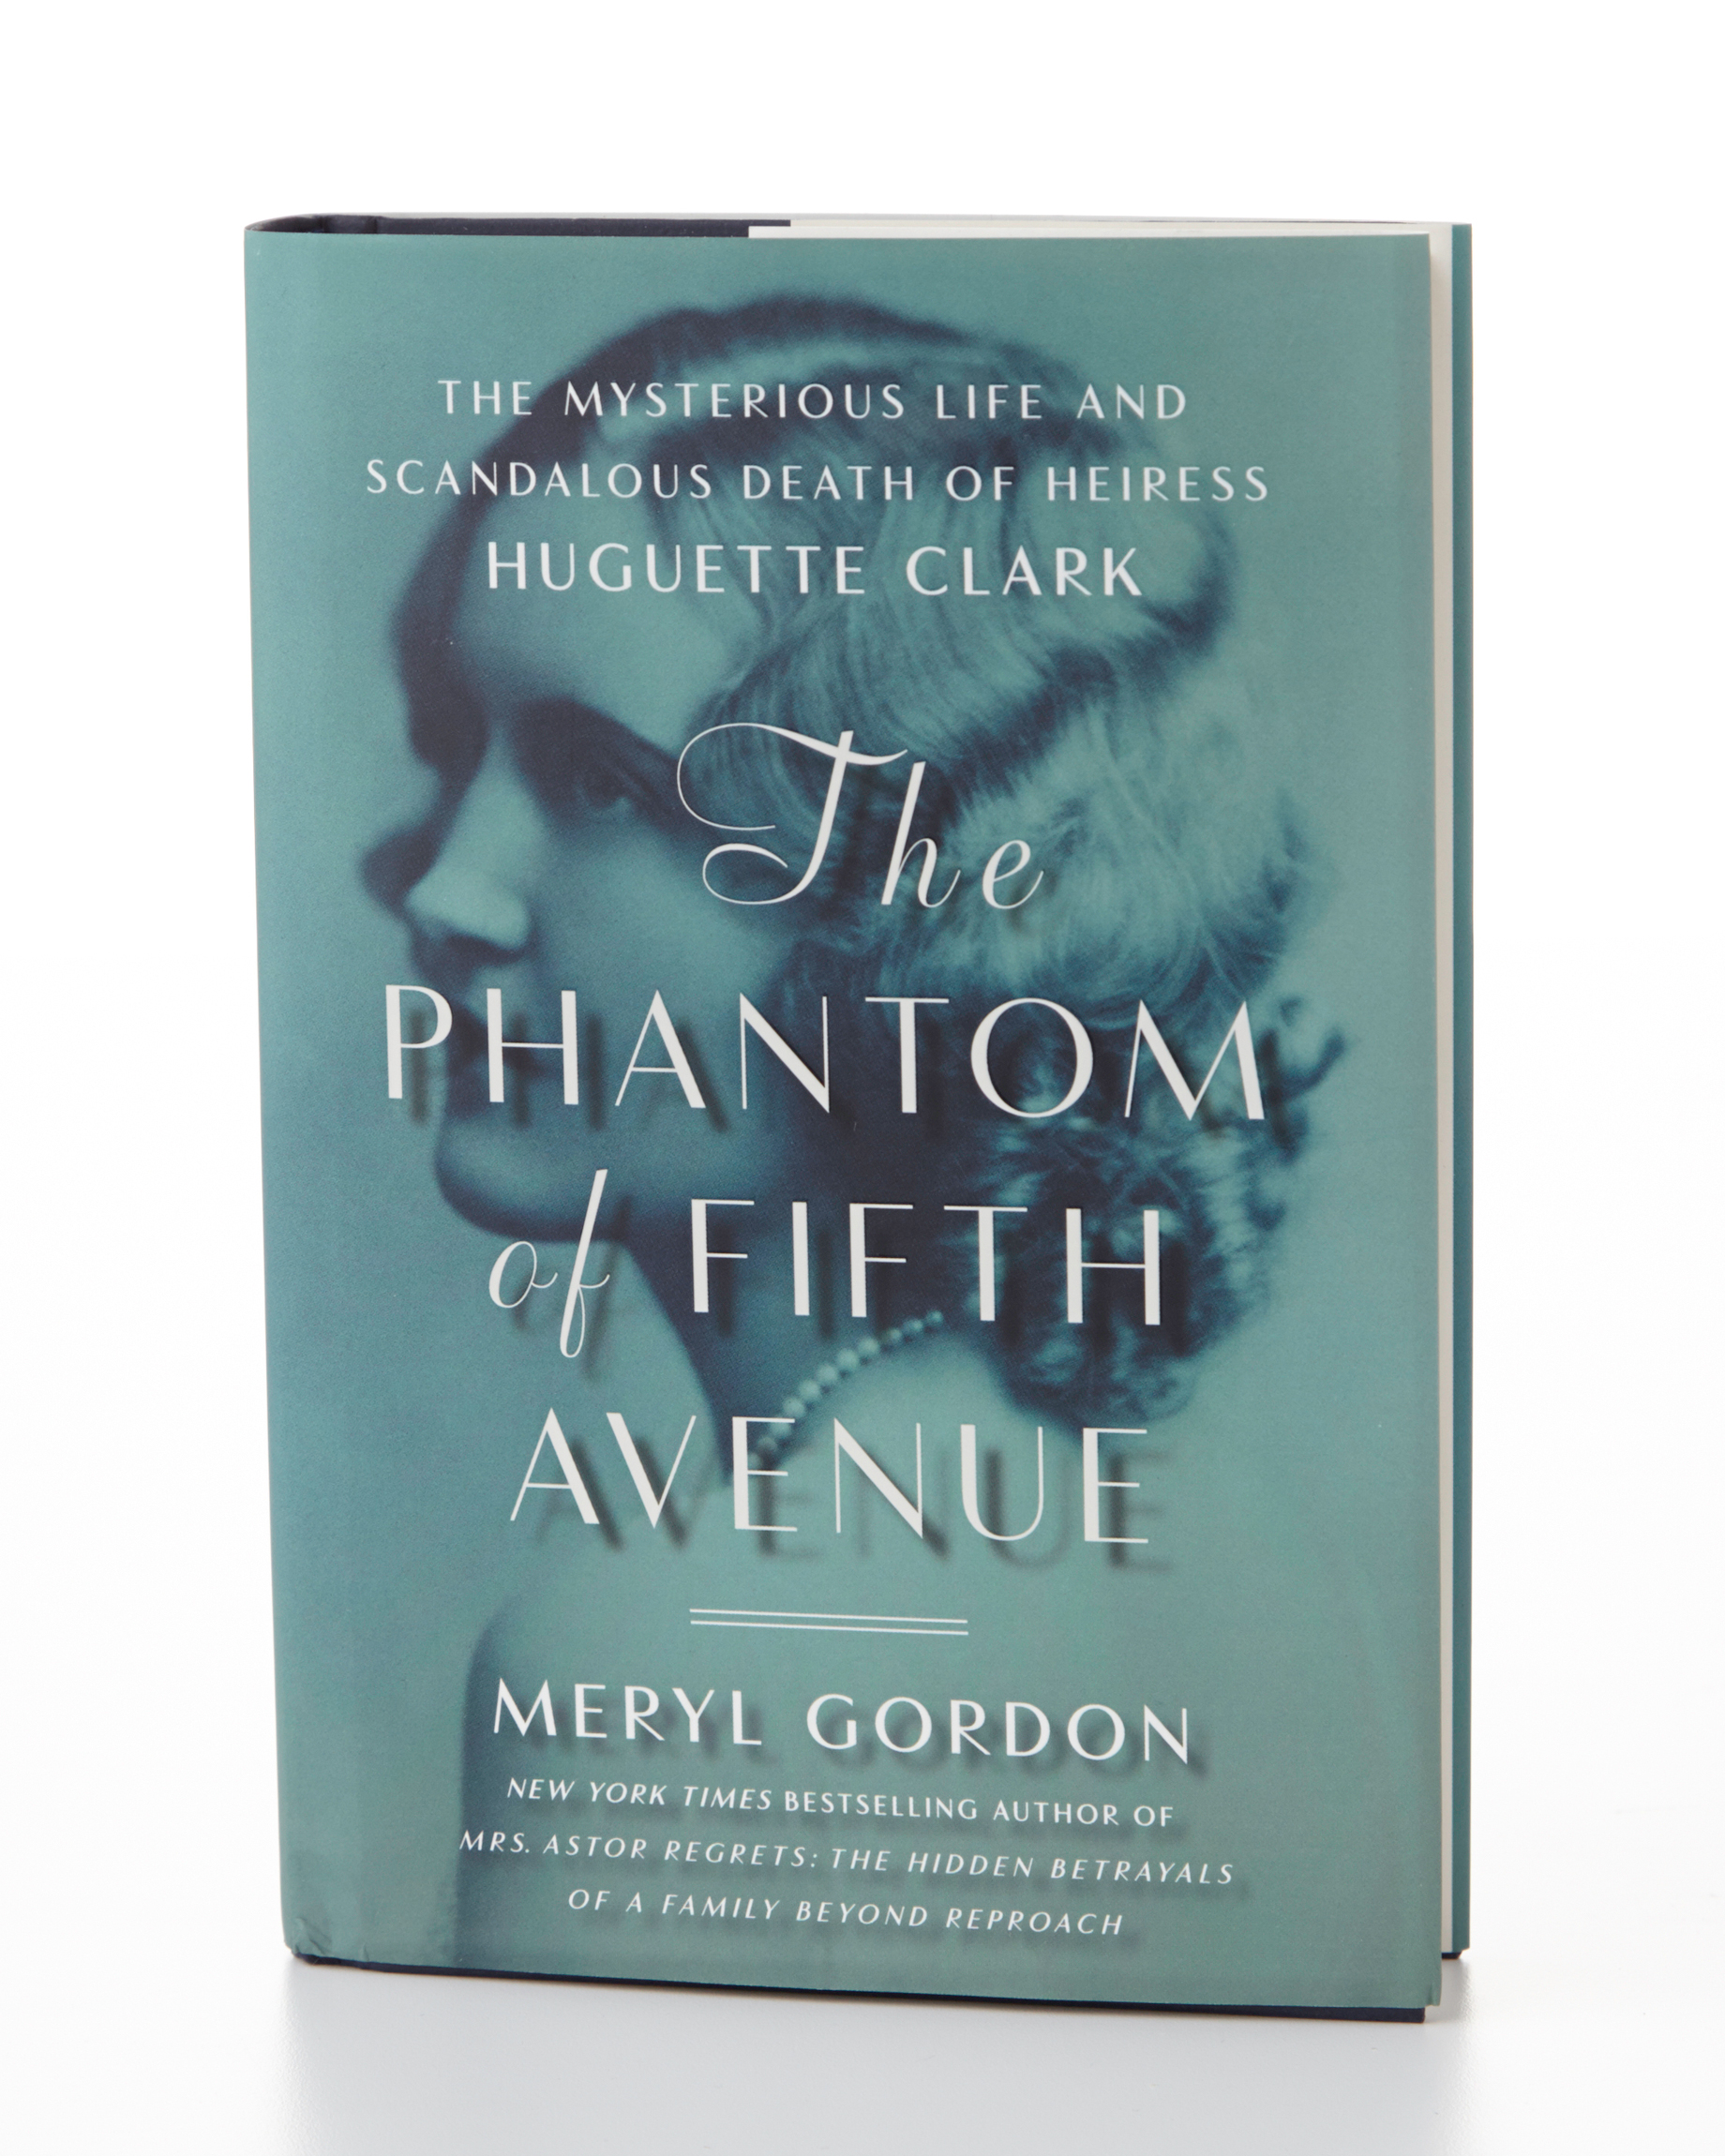 honeymoon-book-ideas-meryl-gordon-0614.jpg